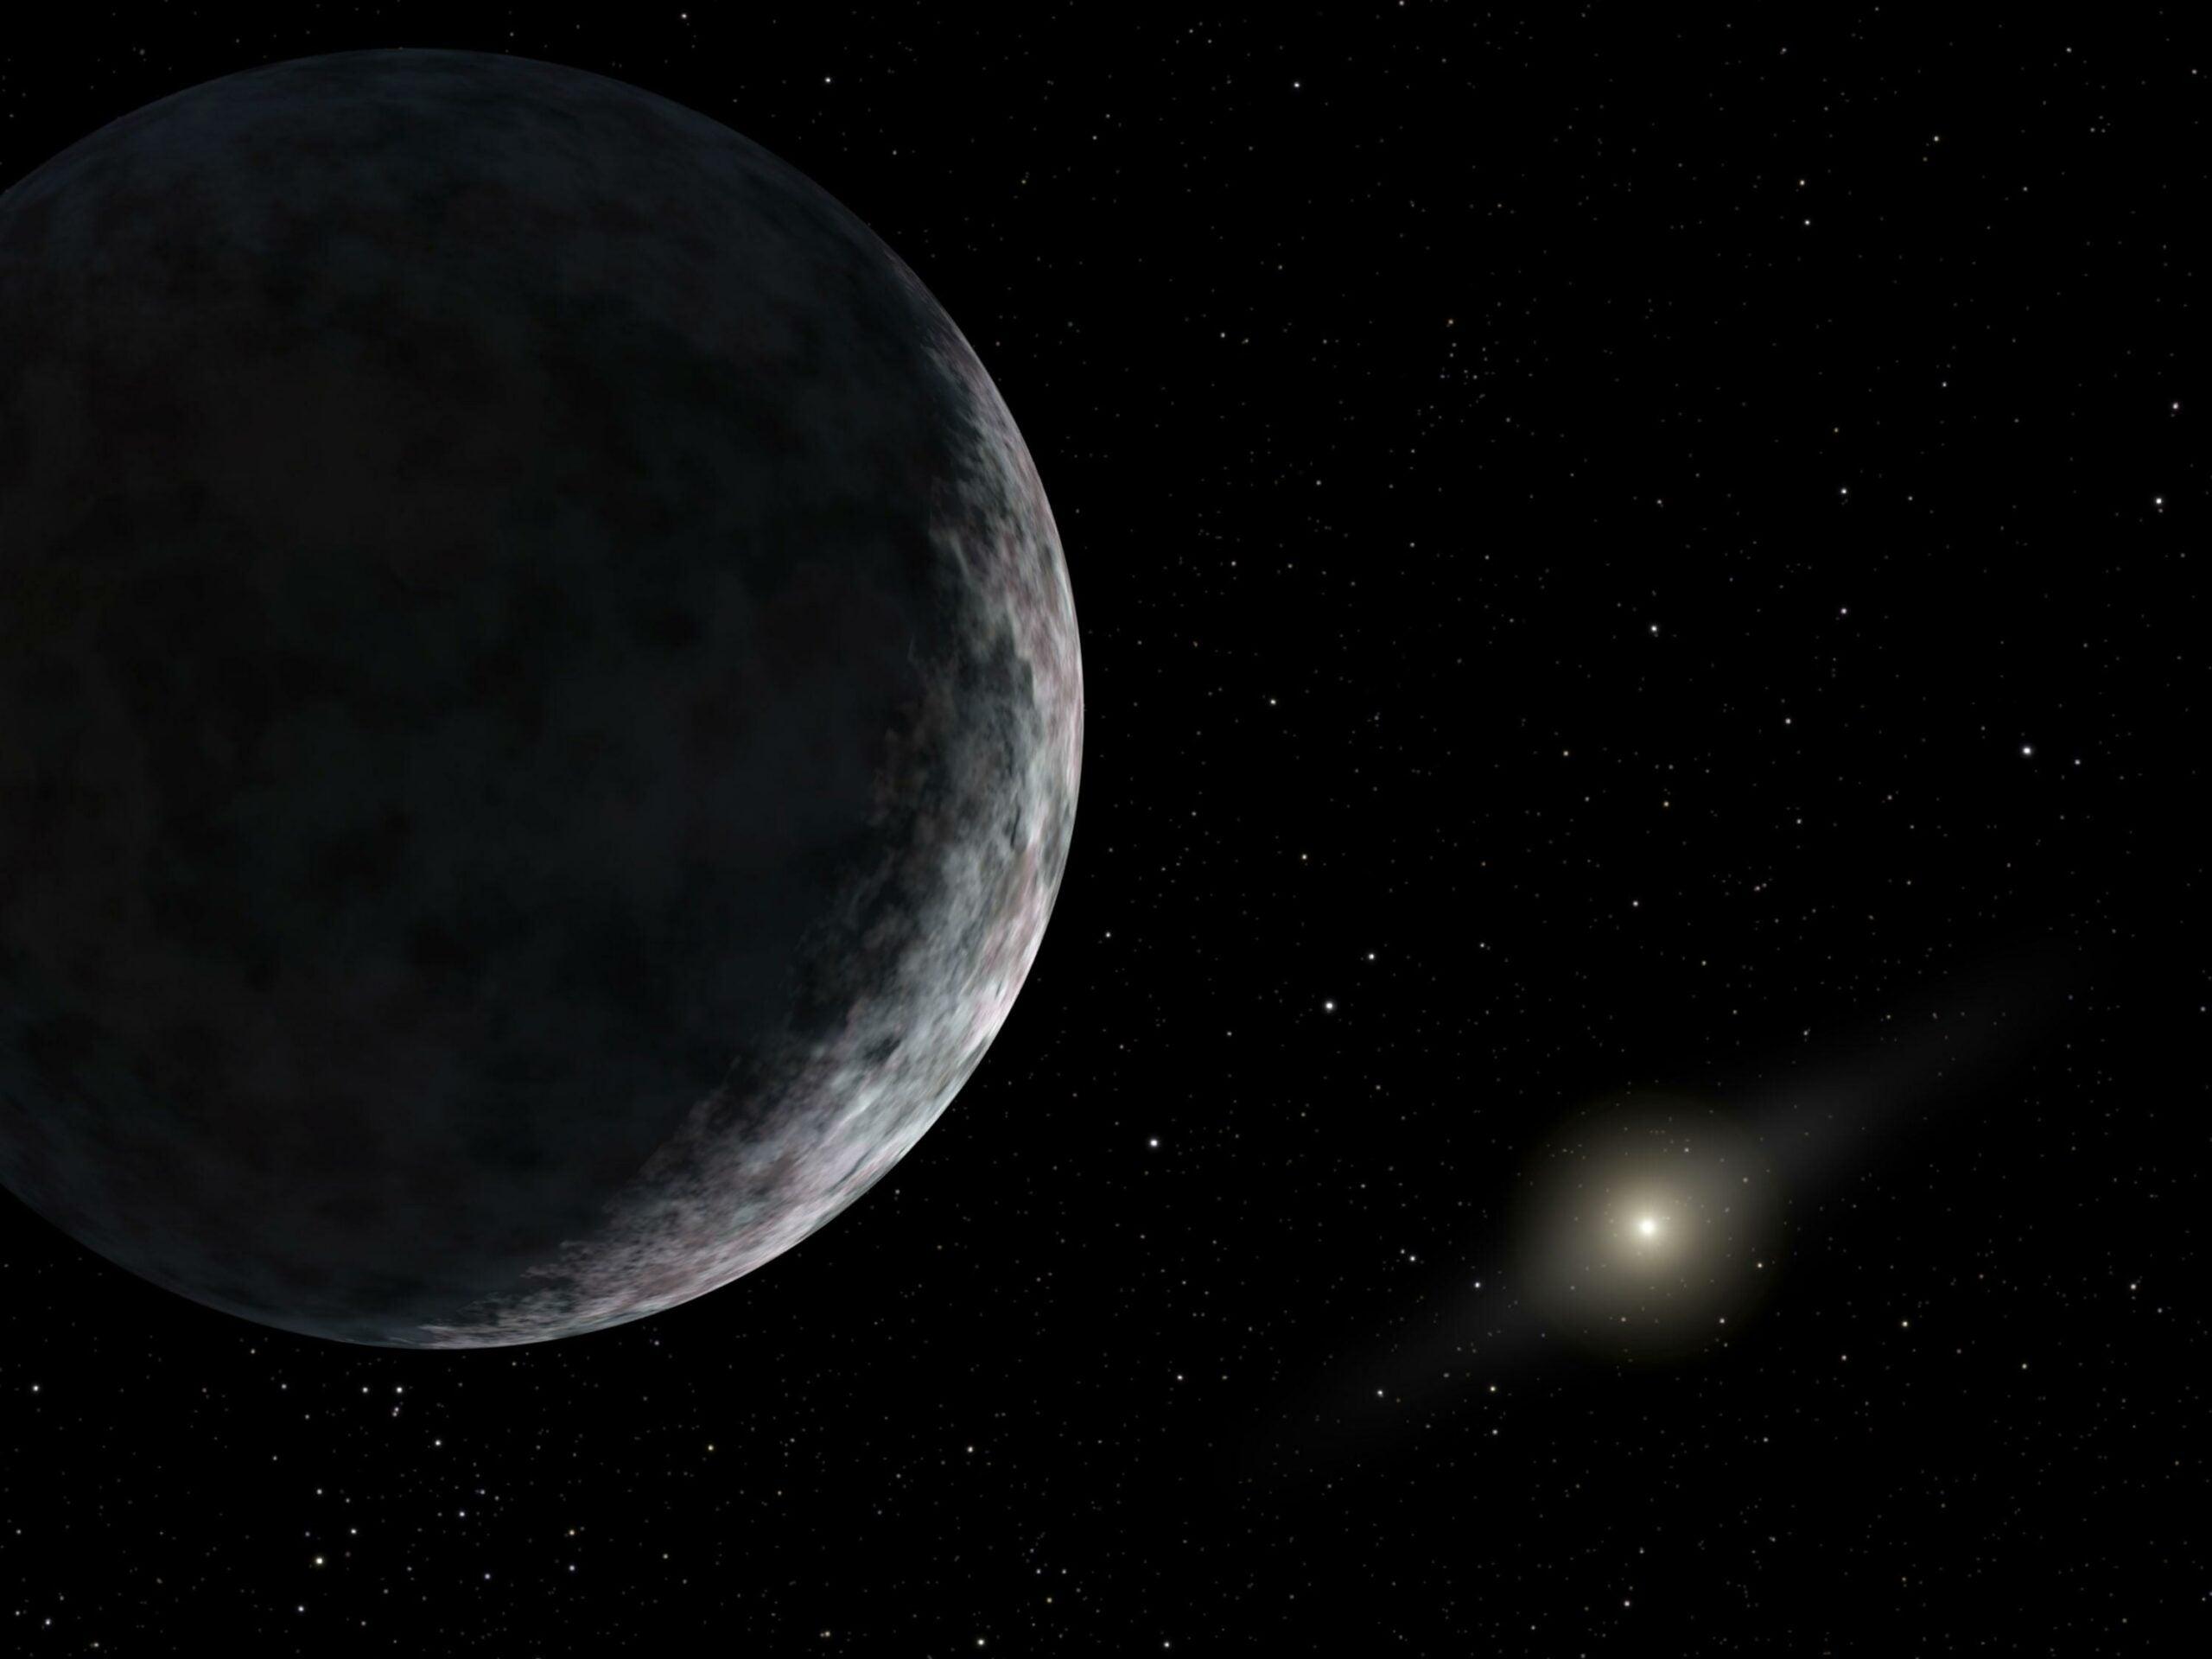 planet edge of solar system